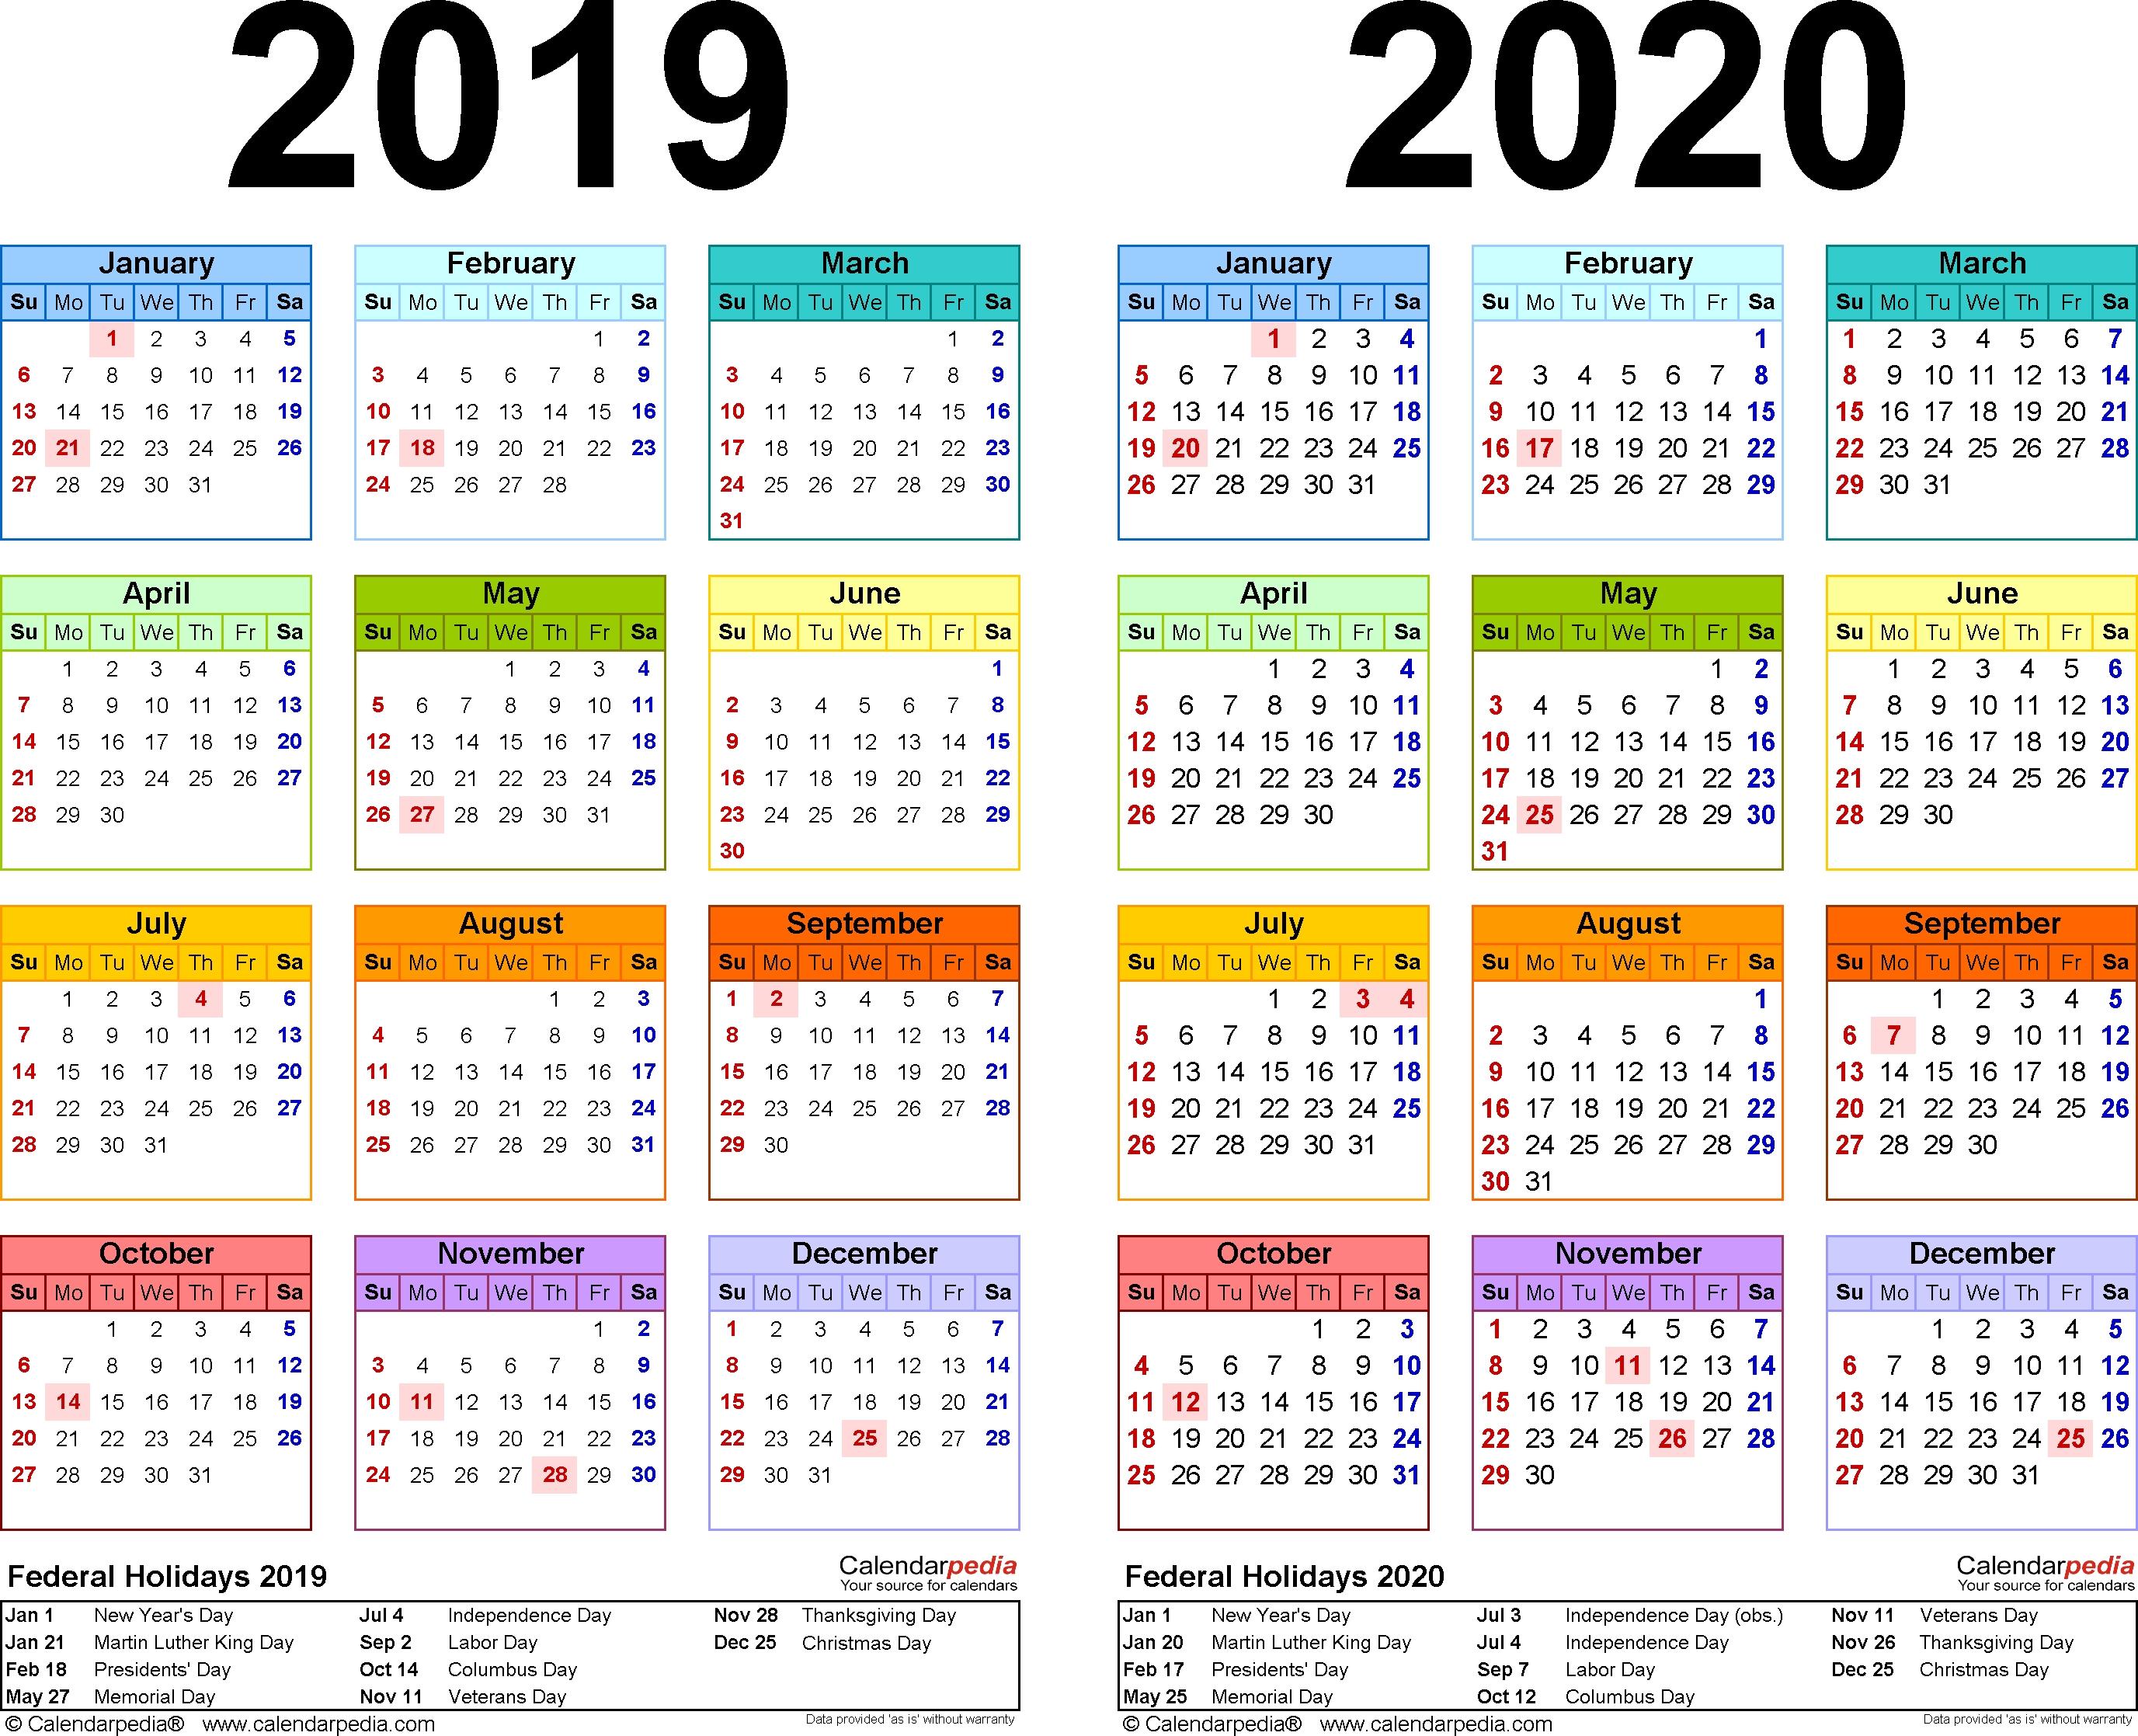 2019-2020 Calendar - Free Printable Two-Year Pdf Calendars-Template Of 2020 August Thru Dec Calendar